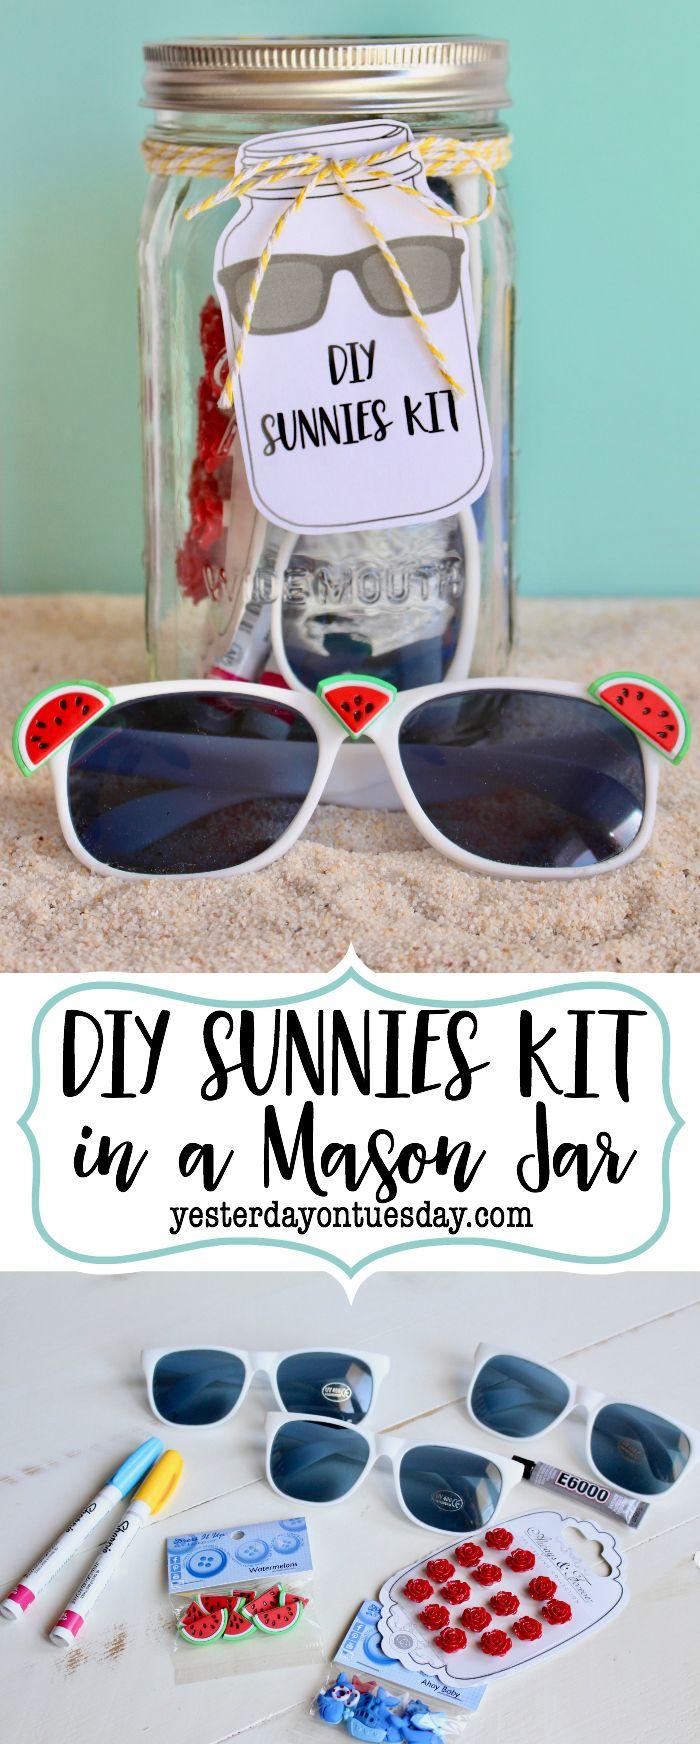 78 best mason jars - summer images on pinterest | diy, cards and